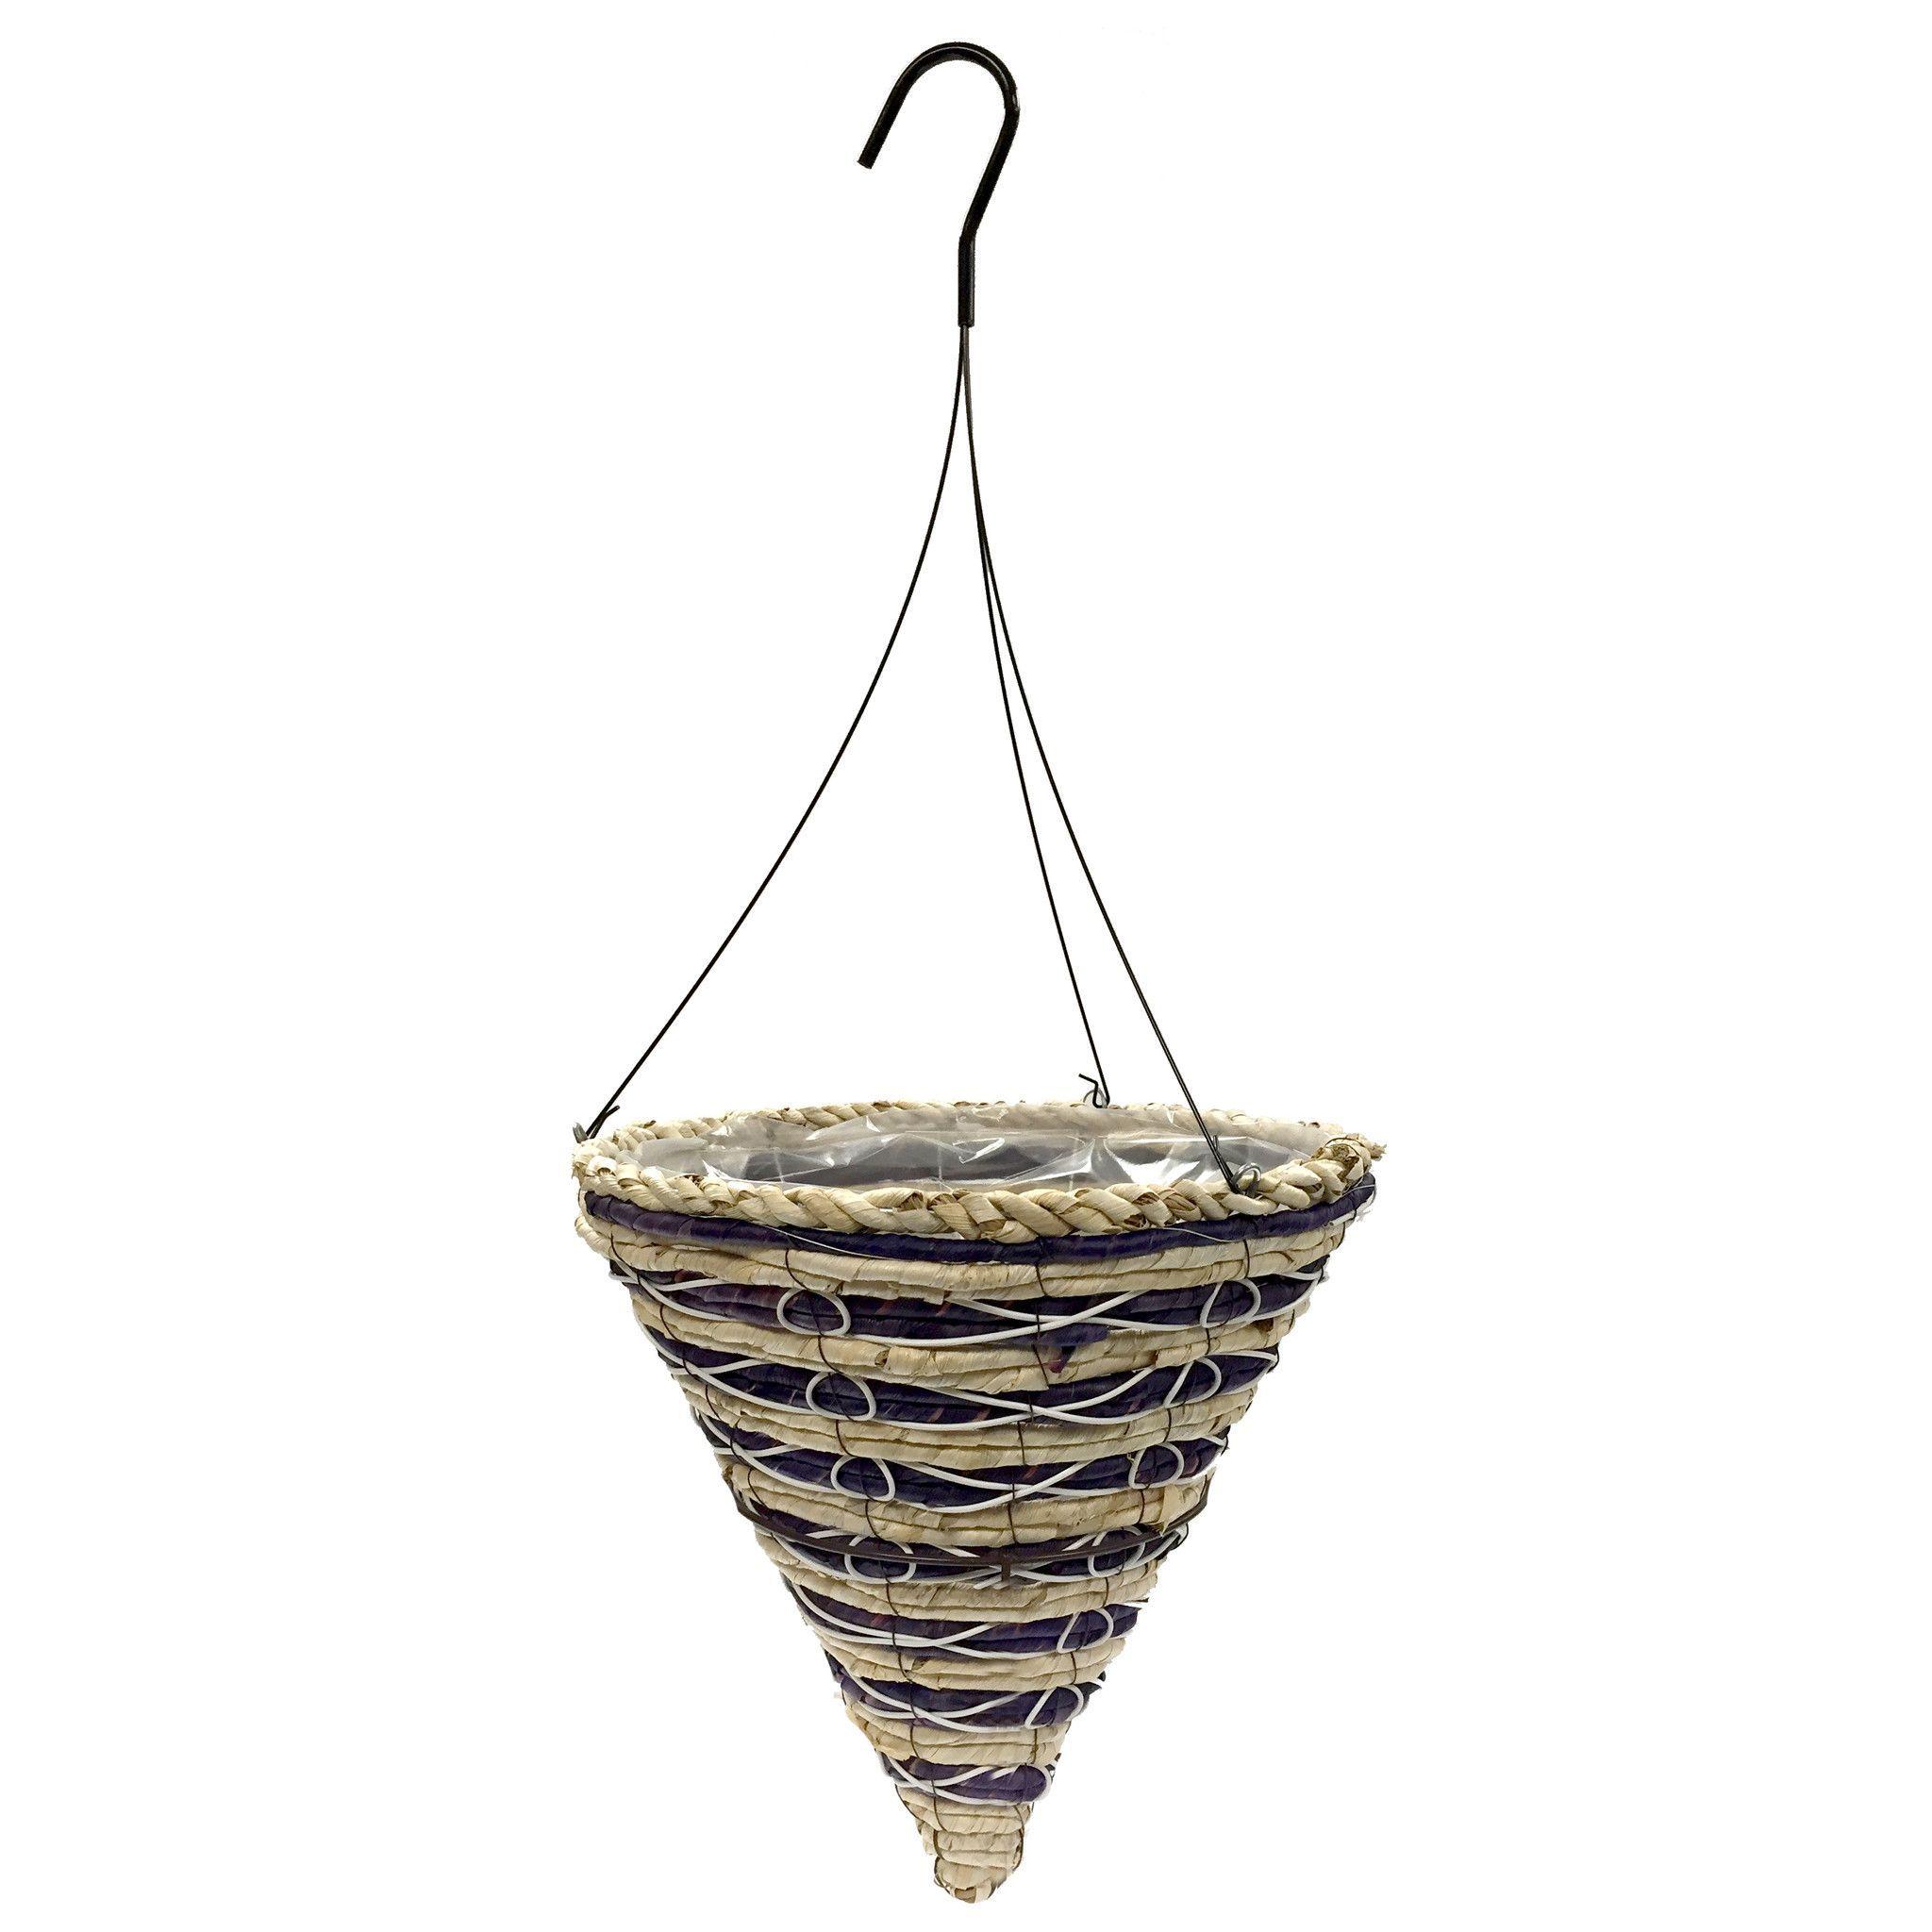 Cone Hanging Basket W Wire Hanger20 Case Hanging Baskets Hanging Cone